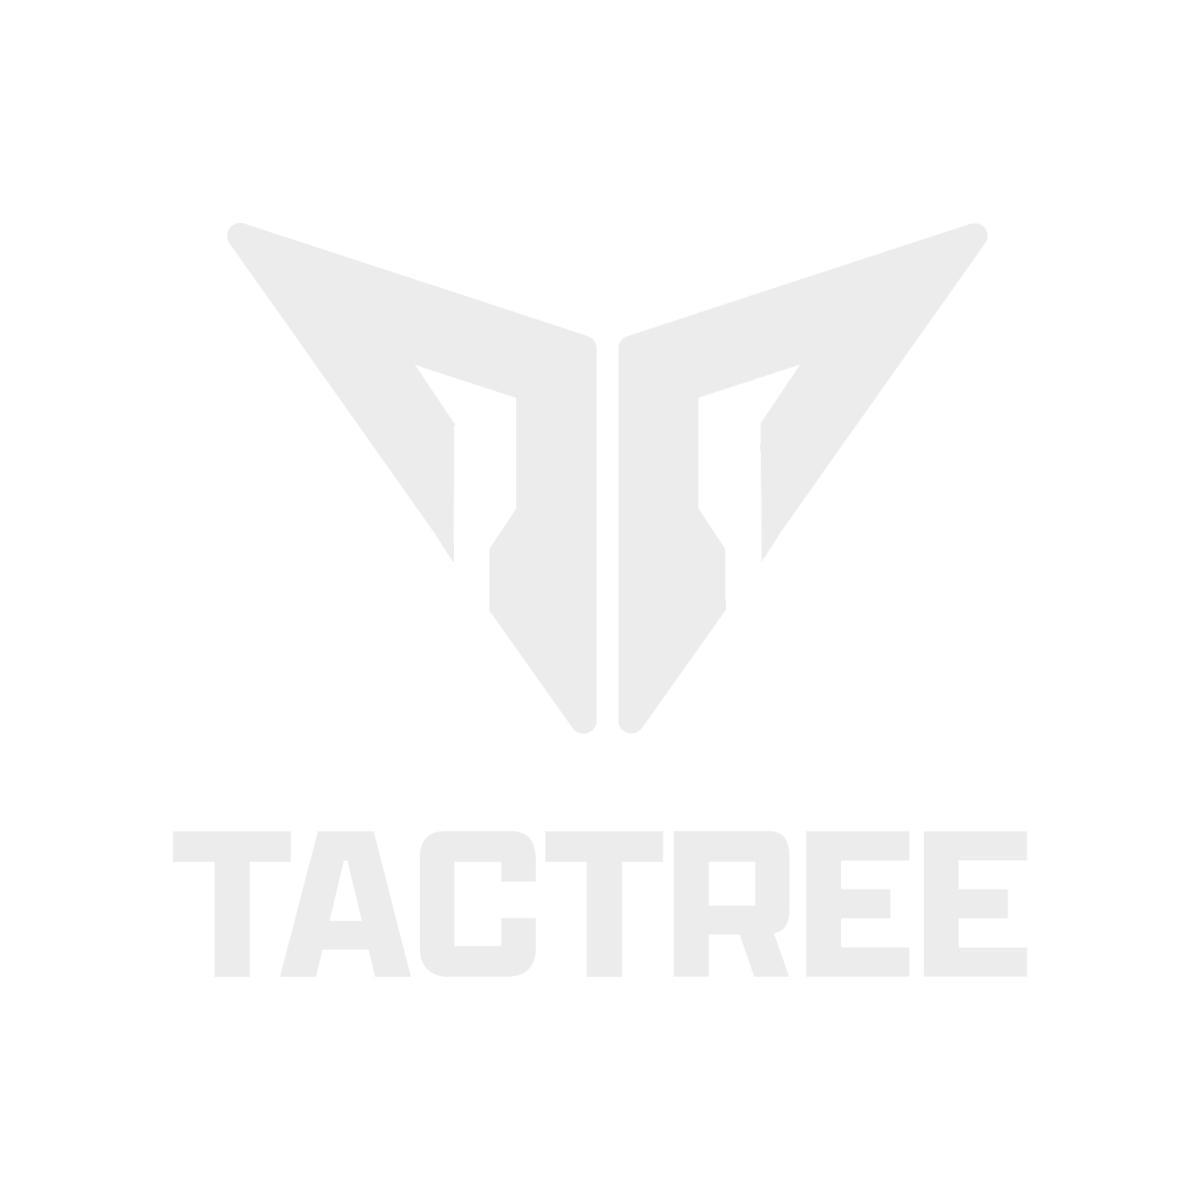 f5f9a562835 Tactical Shirts, Polo Shirts & T-Shirts   Professional & Casual